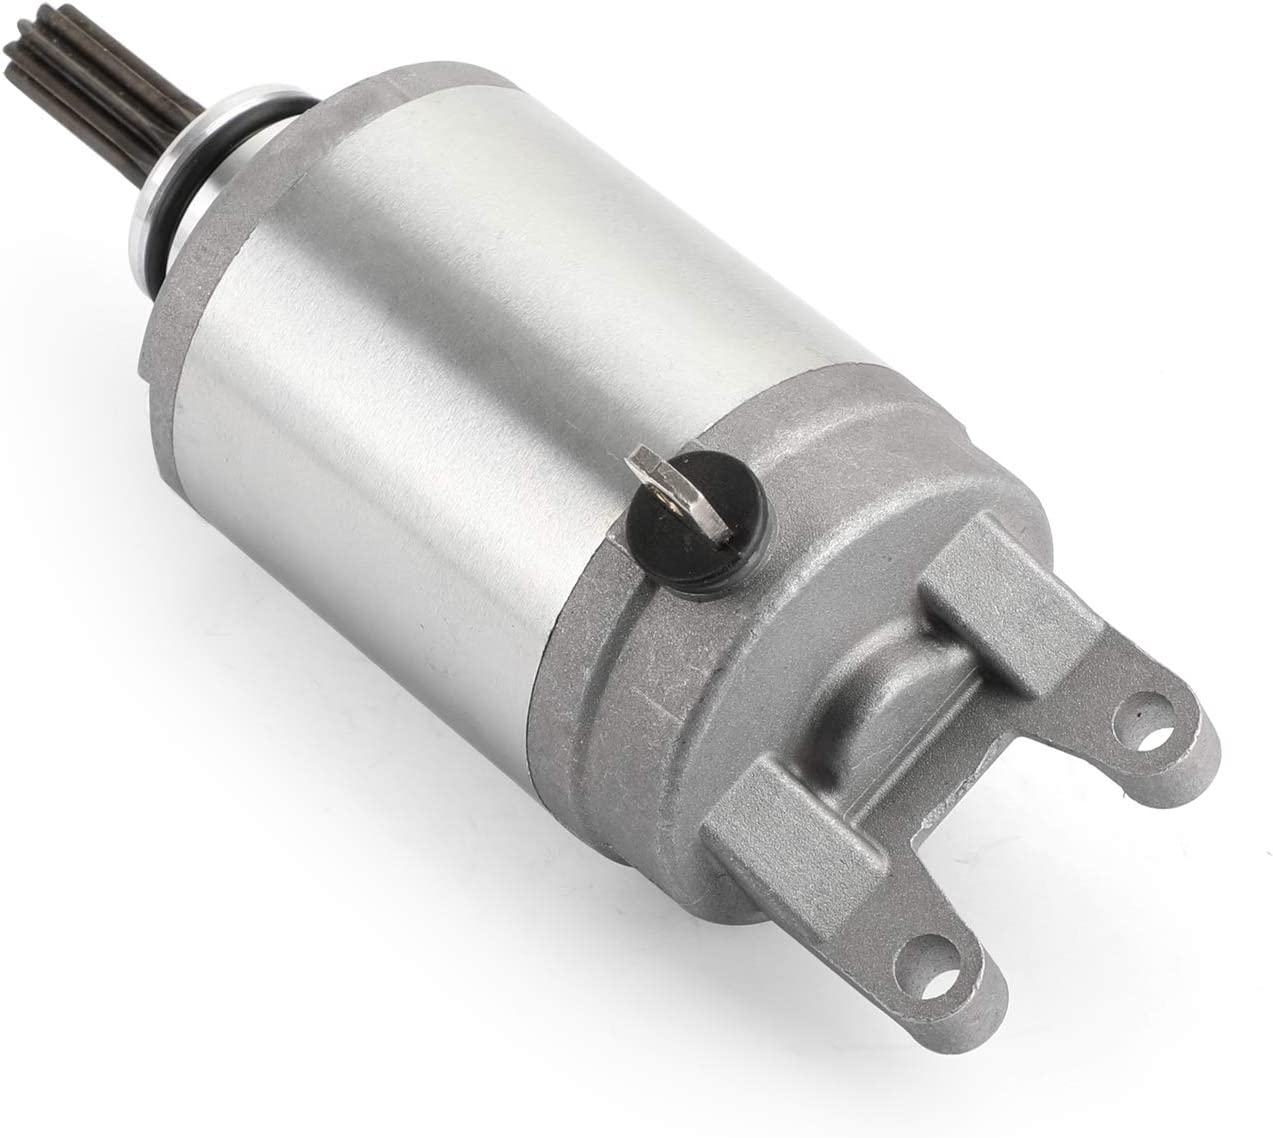 Motor-Startermotor f/ür SUZU-KI LTR450 LT-R450 LT-R450Z QUADRACER 450 2006-2011 31100-45G00 12 V Artudatech Motorrad-Elektro-Startermotor